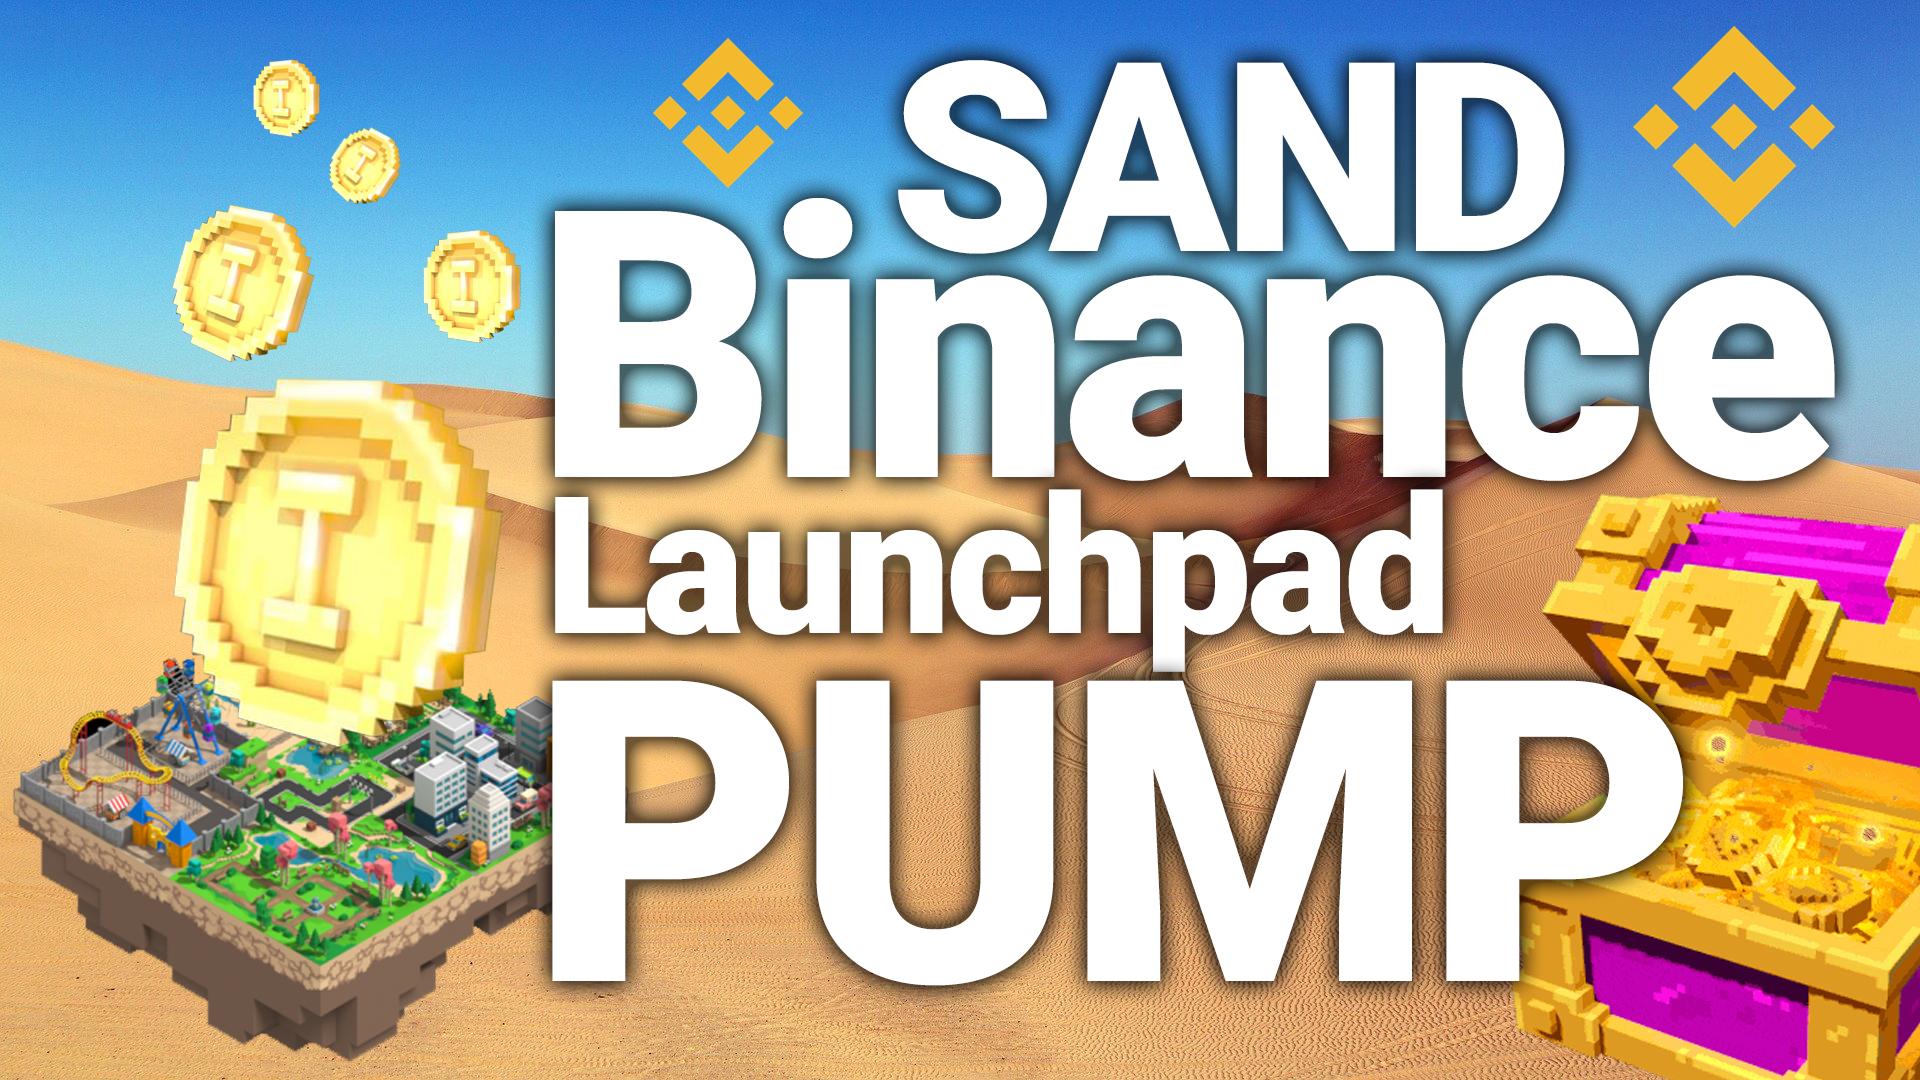 sand land sandbox game binance launchpad token sale coin pump price prediction how to